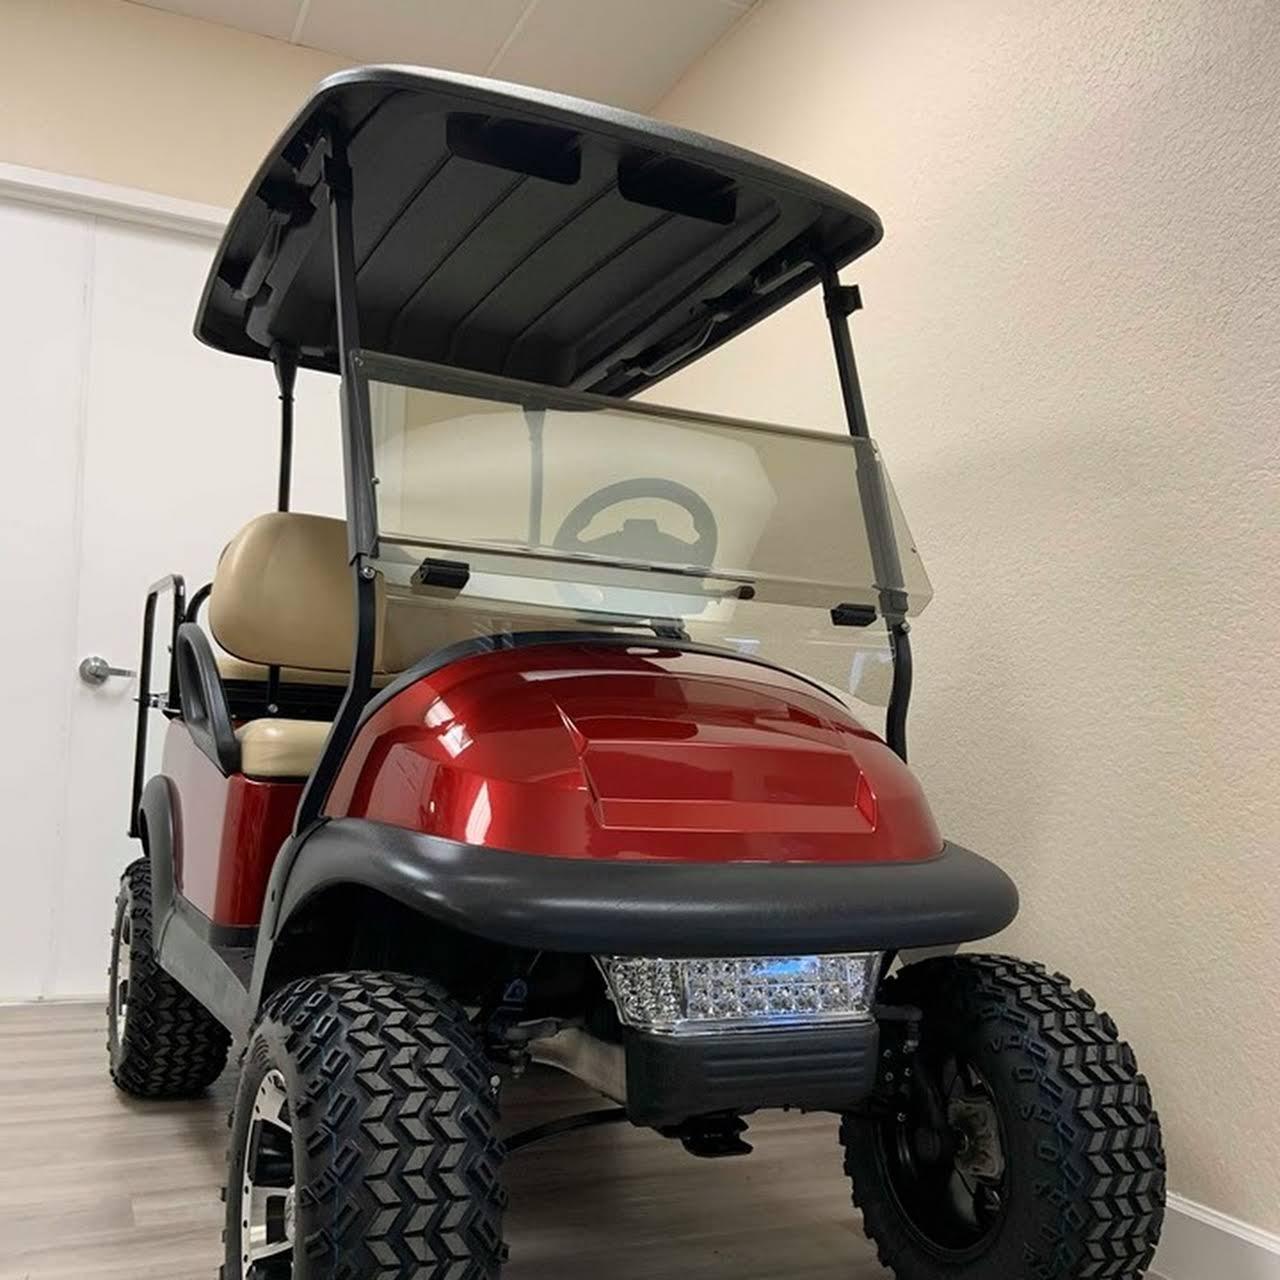 BMK Golf Carts - Golf Cart Dealer in Pompano Beach